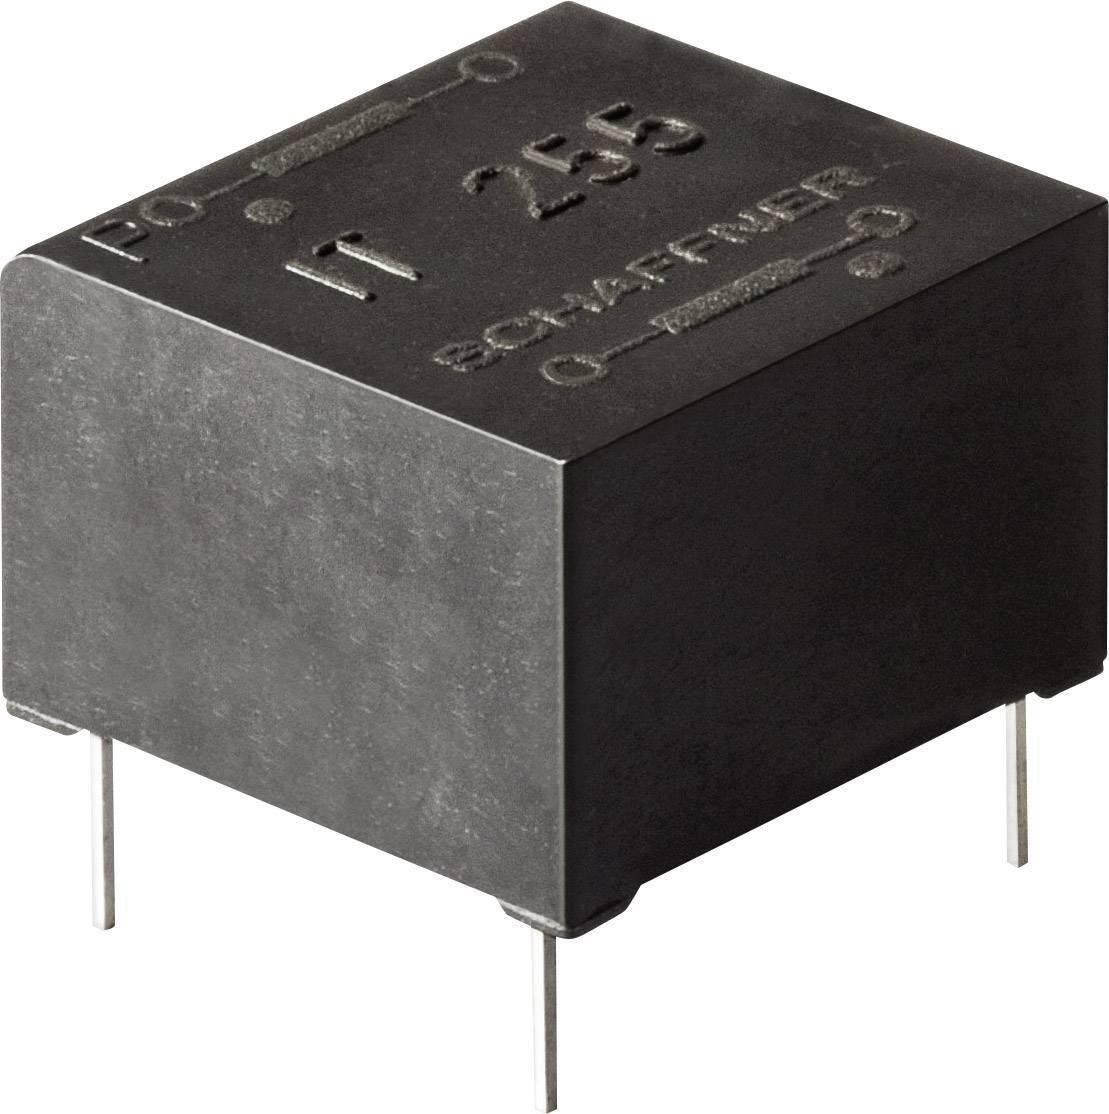 Pulzní transformátor Schaffner, IT258, 2,5 mH, max 3000 V